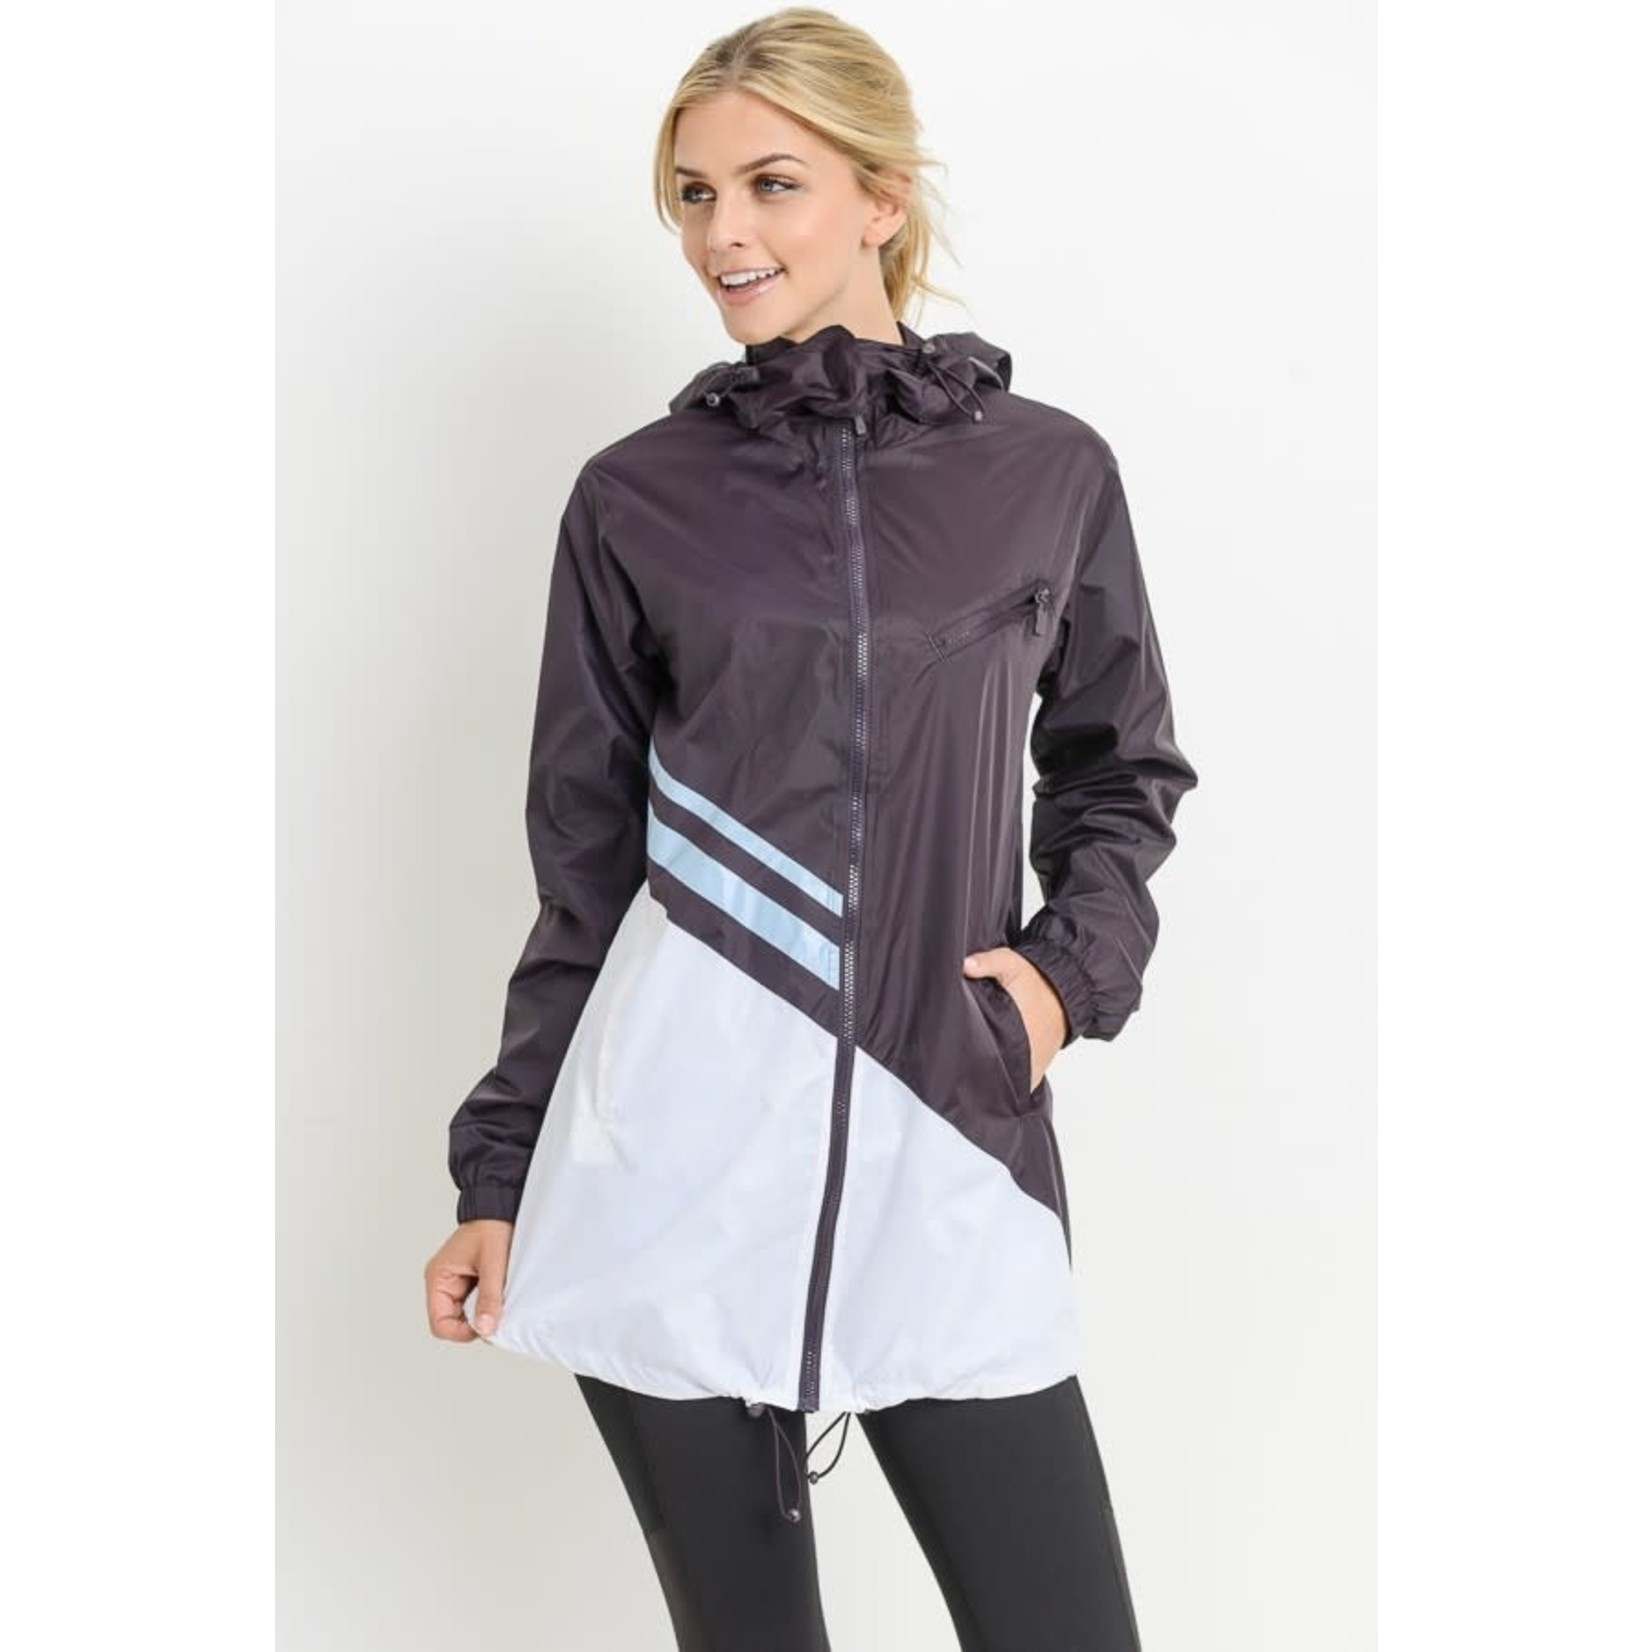 Mono B Activewear: Plum Colorblock Windbreaker: Large